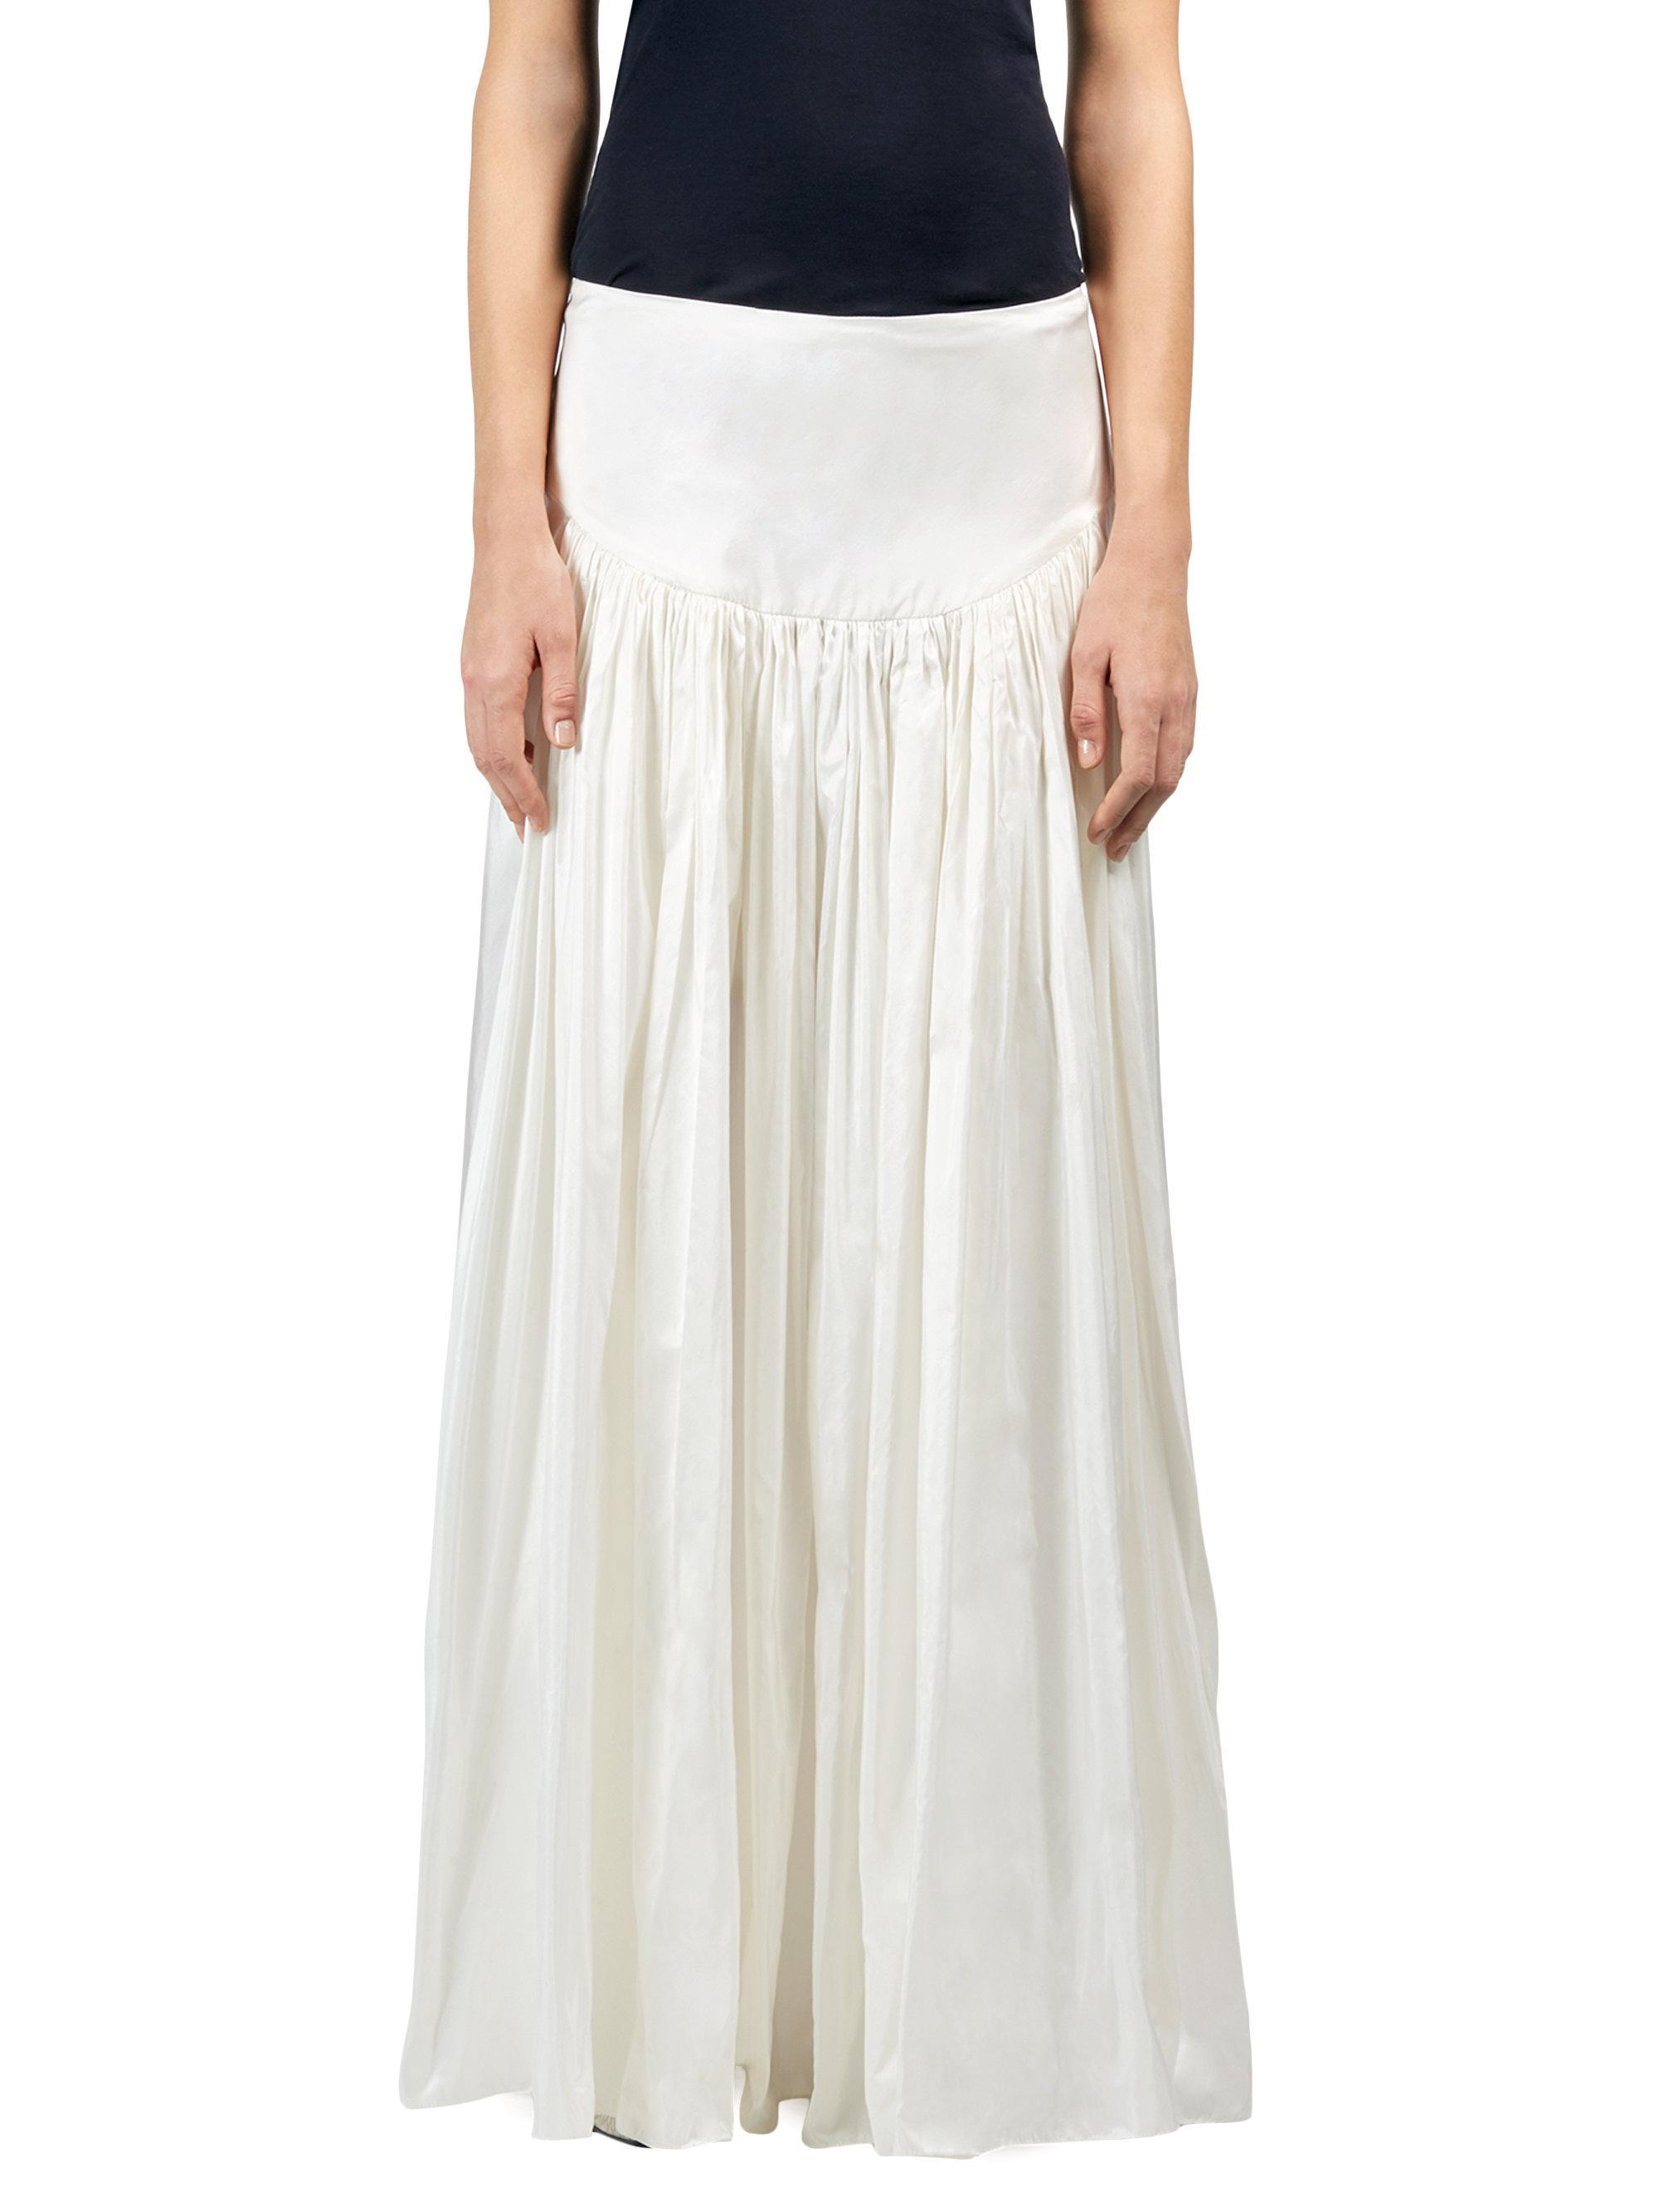 b11bb598ad2 Stella McCartney Taffeta Drop-waist Maxi Skirt in White - Lyst